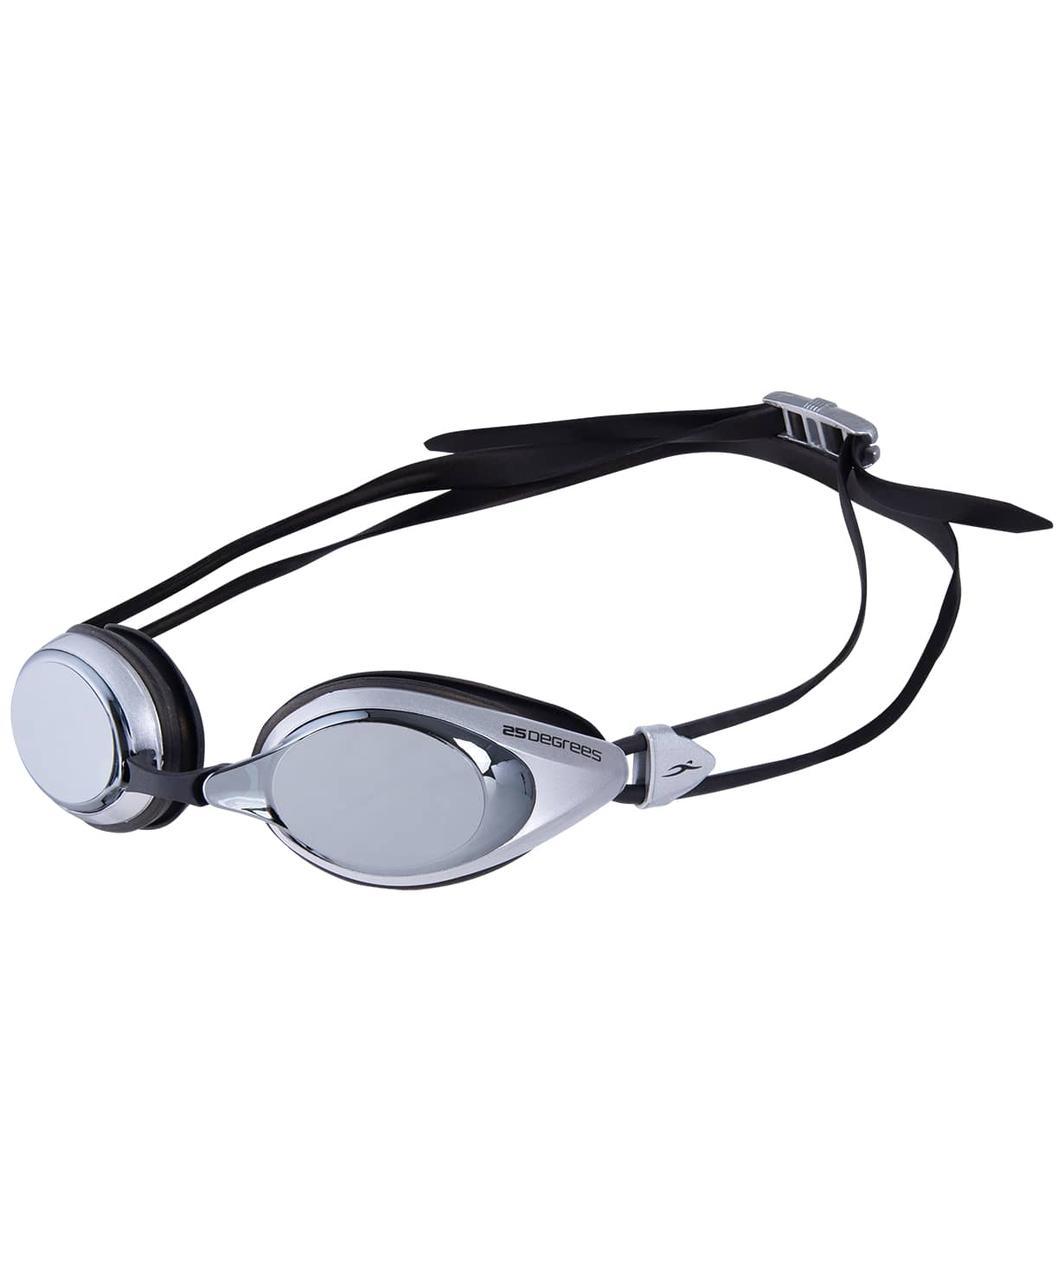 Очки для плавания Pulso Mirrored White/Black 25Degrees